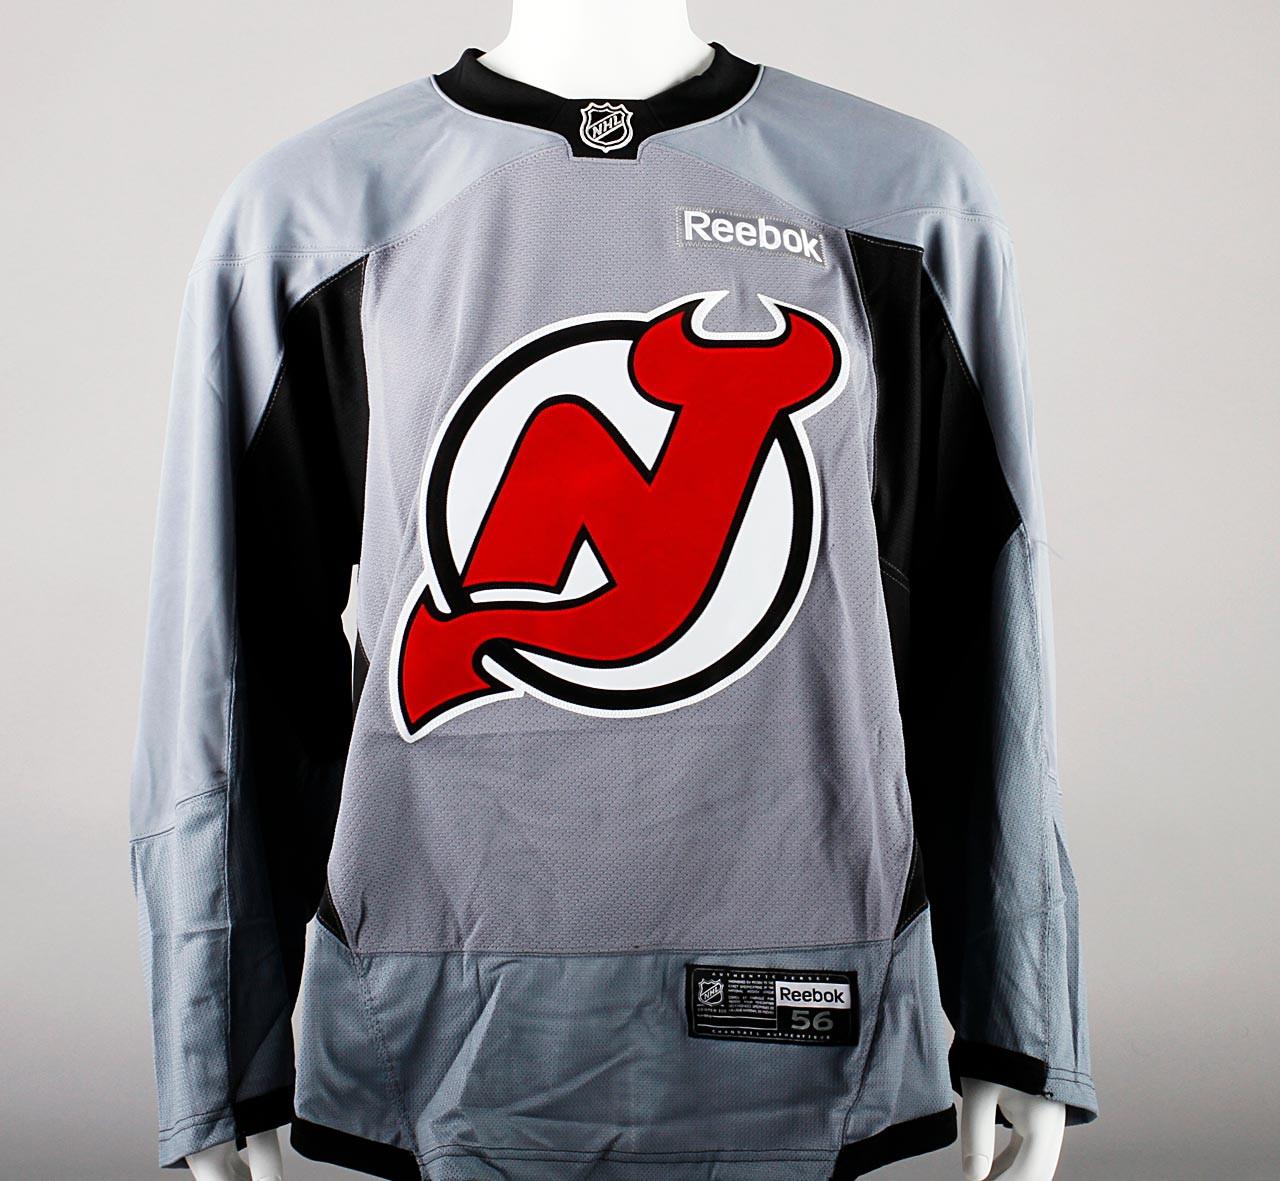 ... Practice Jersey - New Jersey Devils - Gray Reebok Size 56  4. Image 1 8a4924936